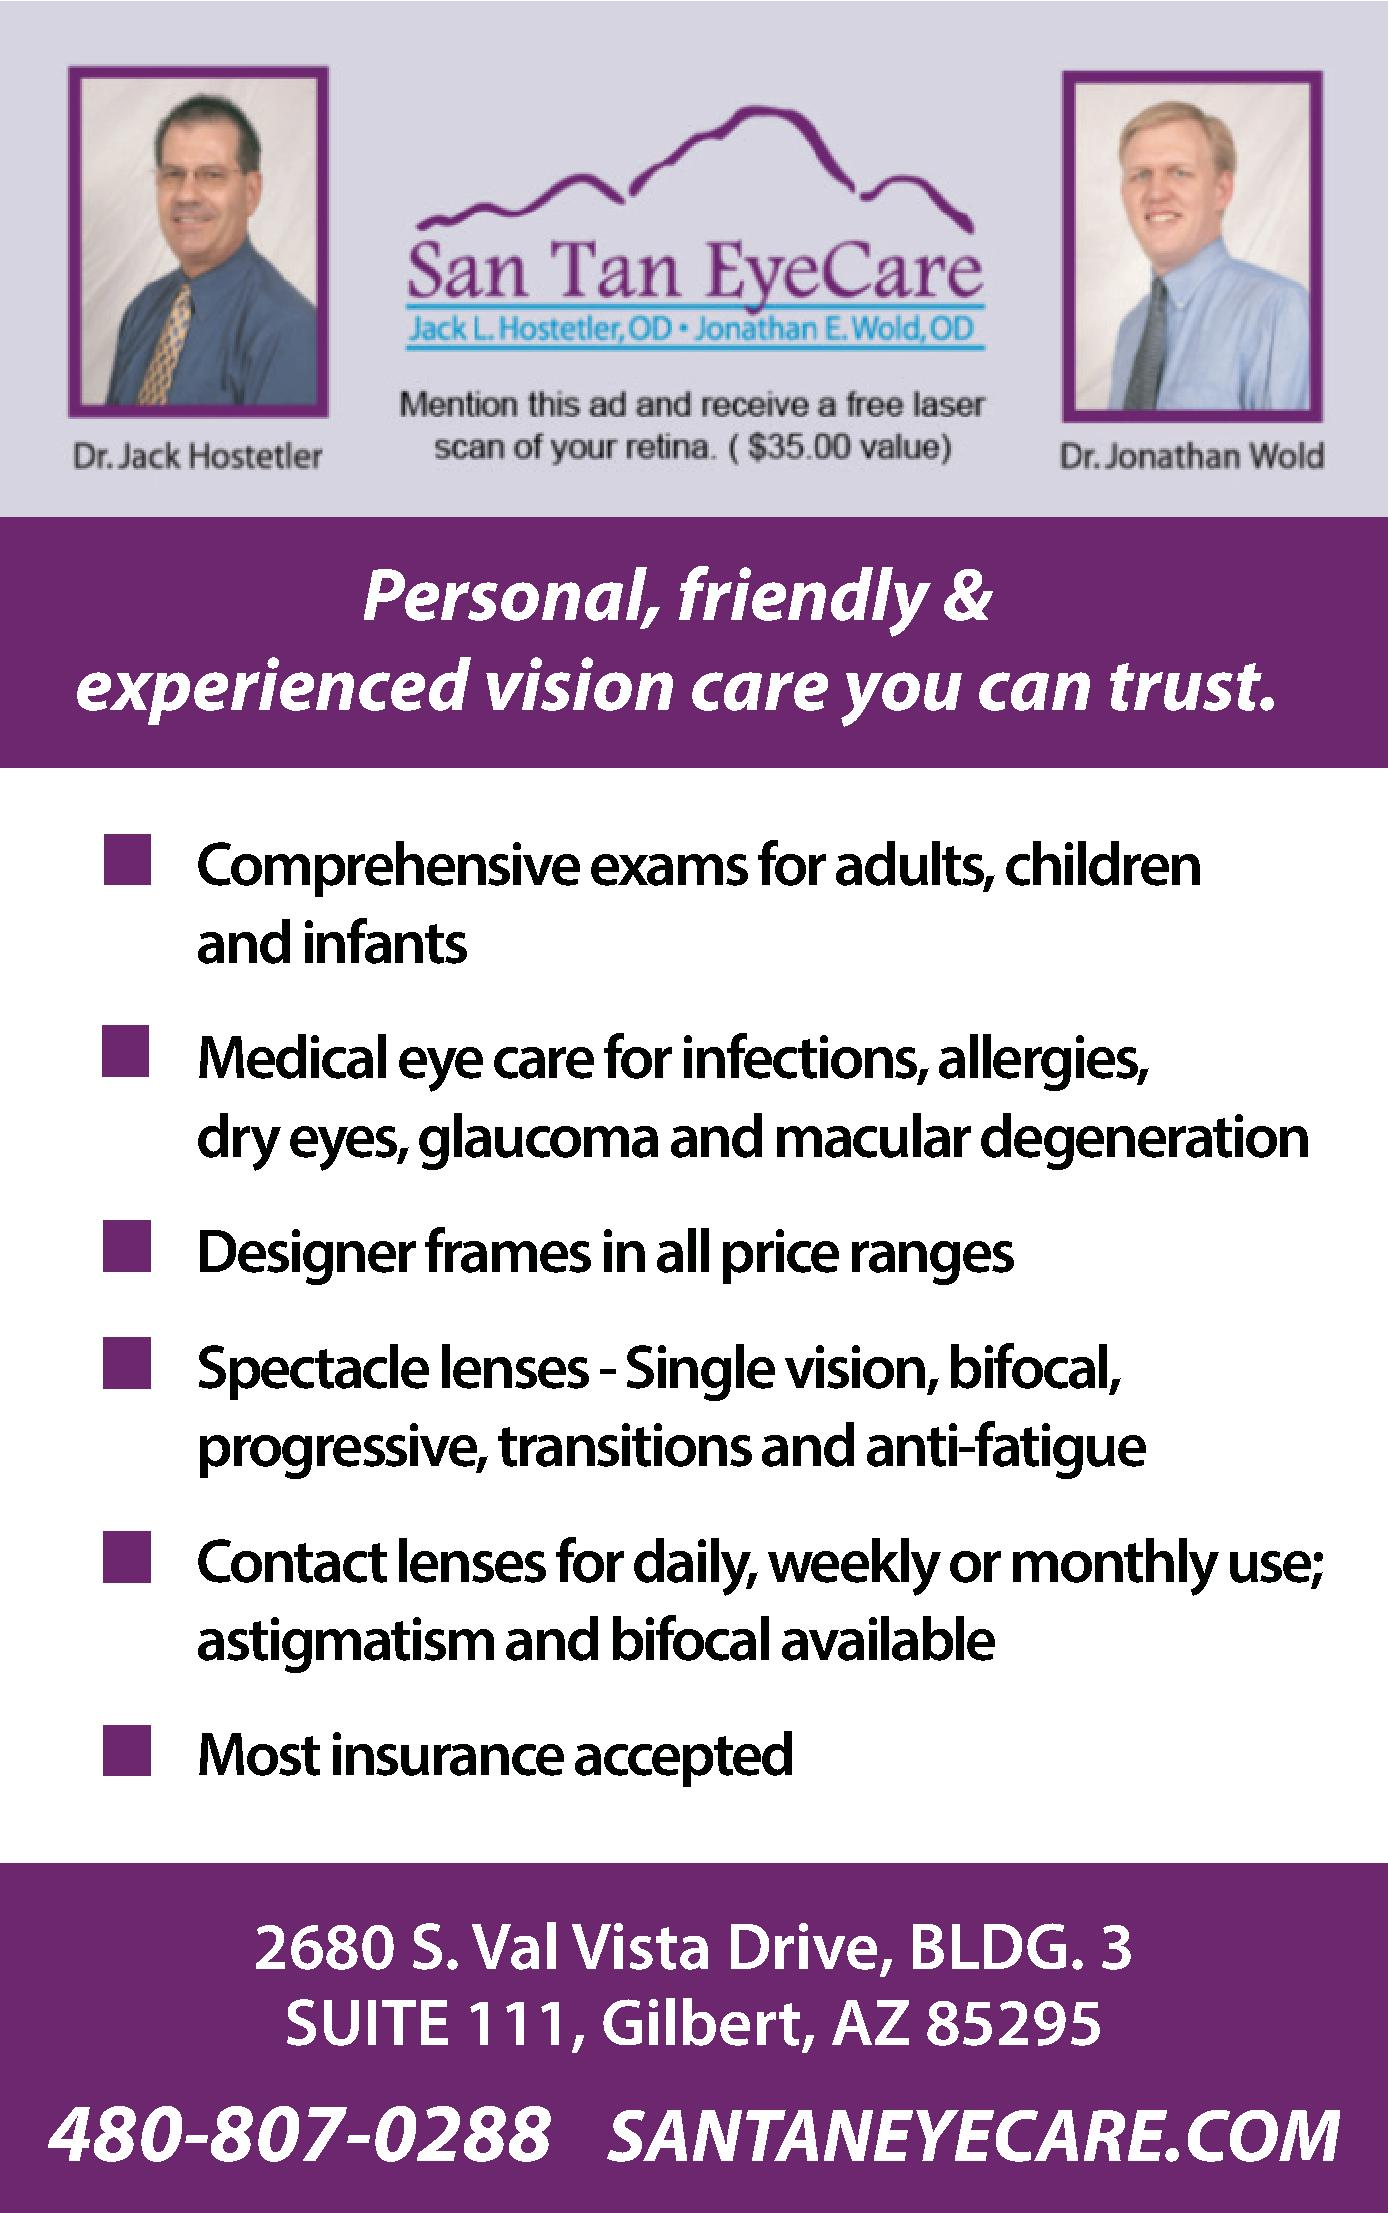 San Tan Eye Care